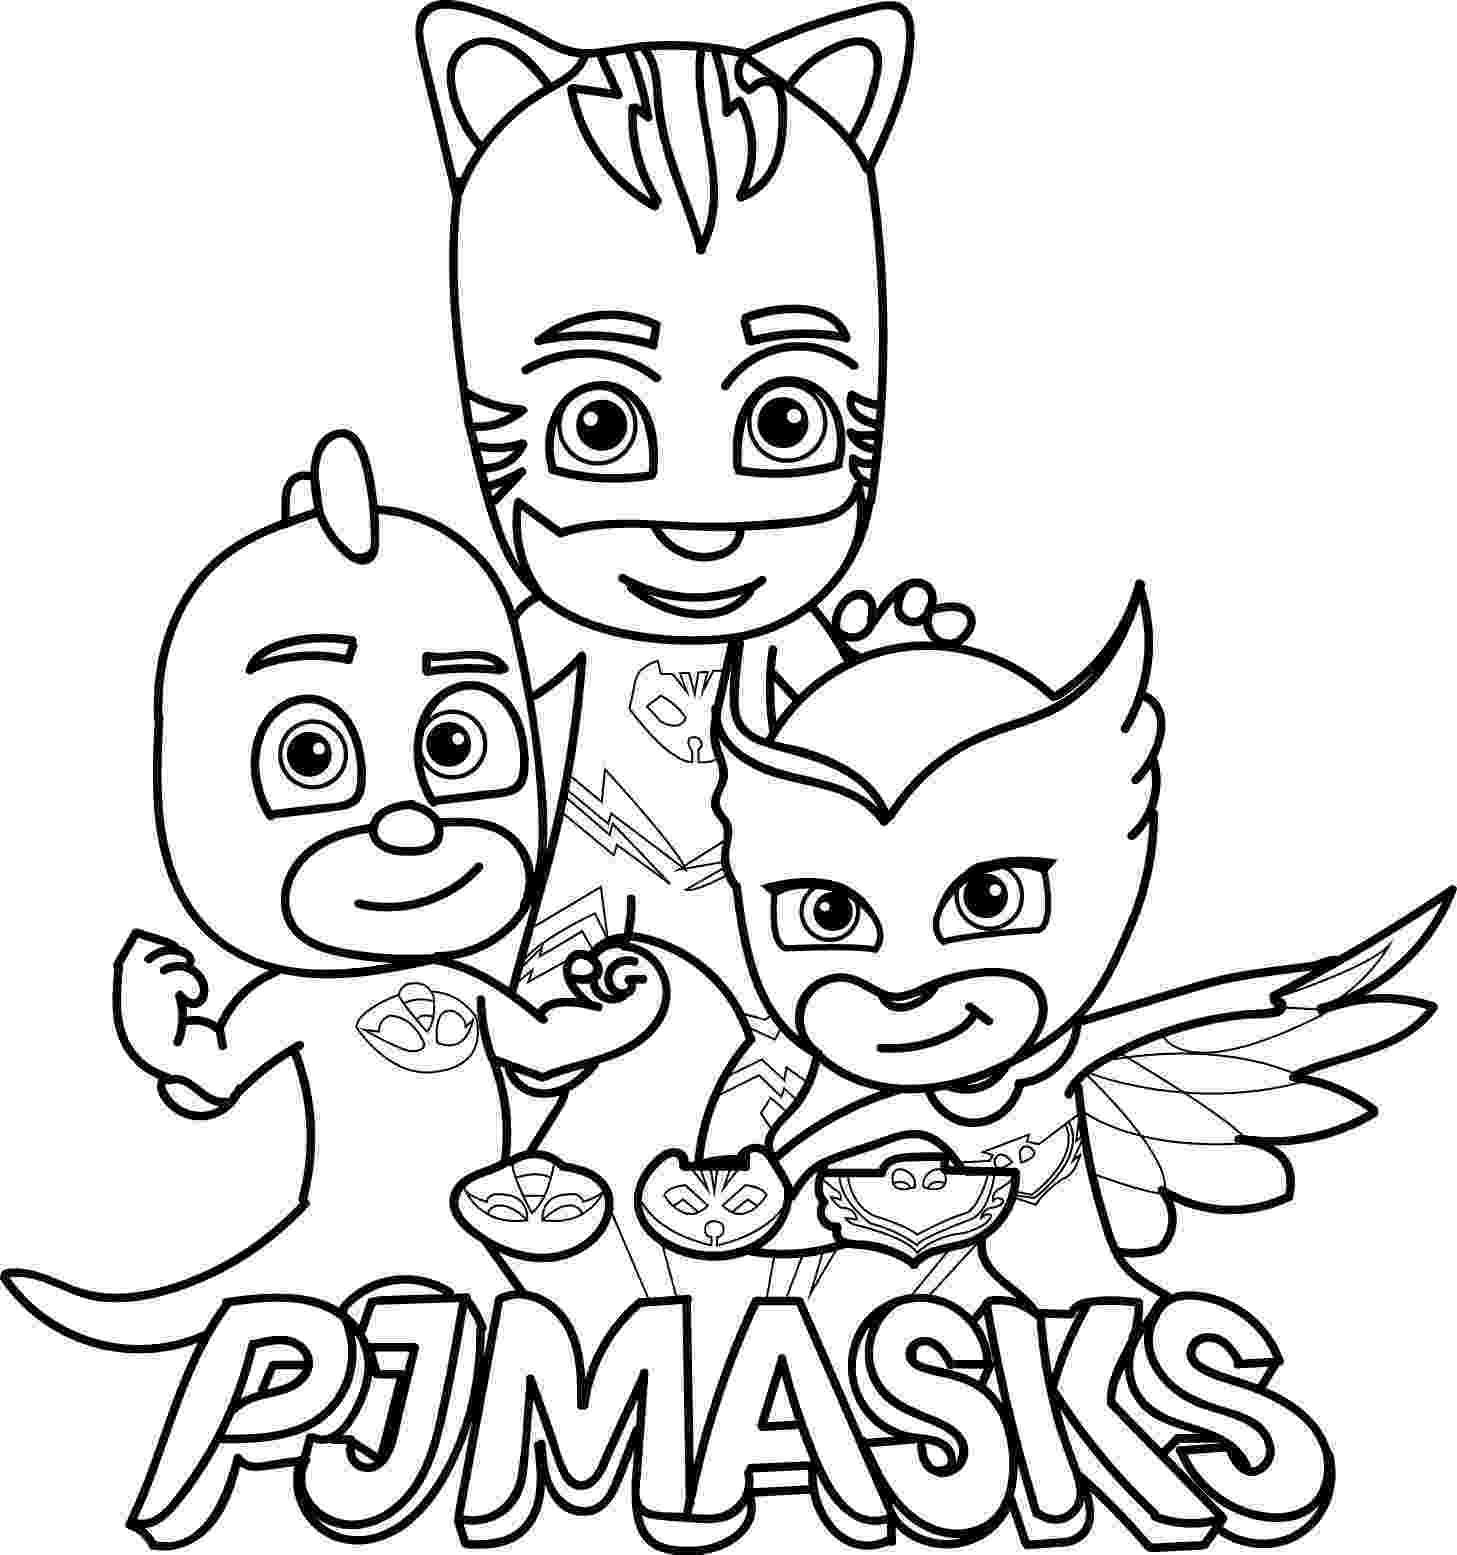 pj masks birthday cake pj masks coloring page pj masks coloring pages coloring birthday cake masks pj